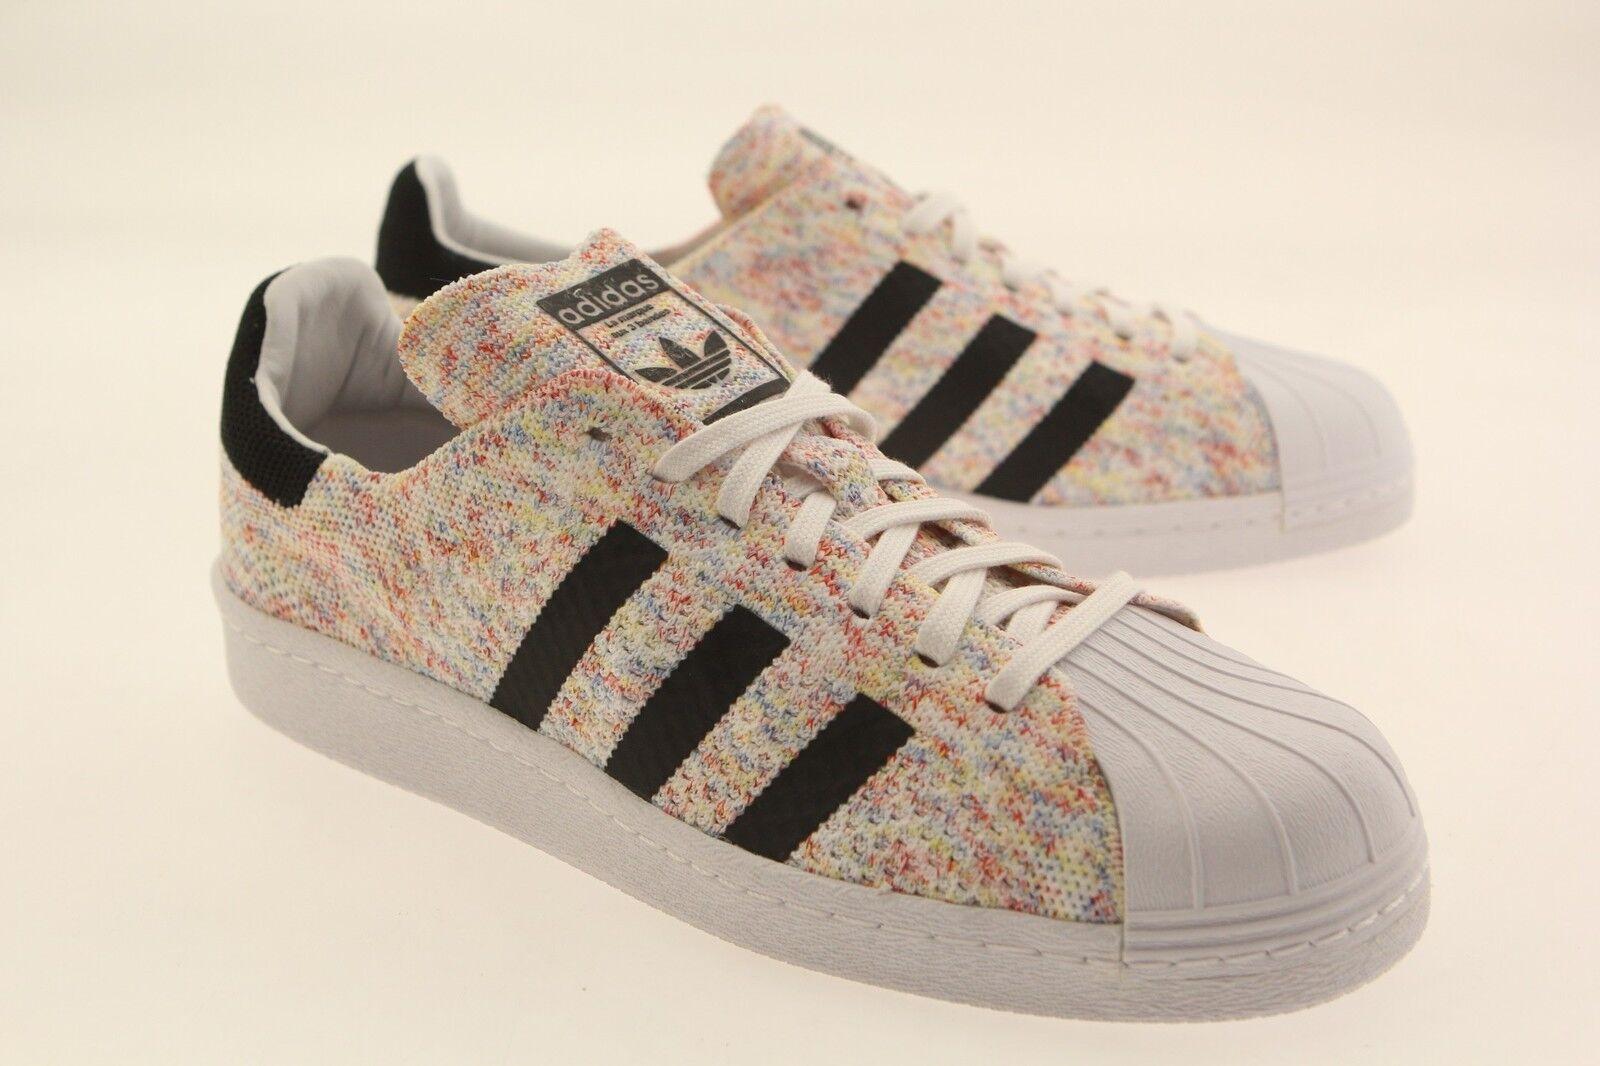 Adidas Men Superstar 80s Primeknit white footwear white core black S75845